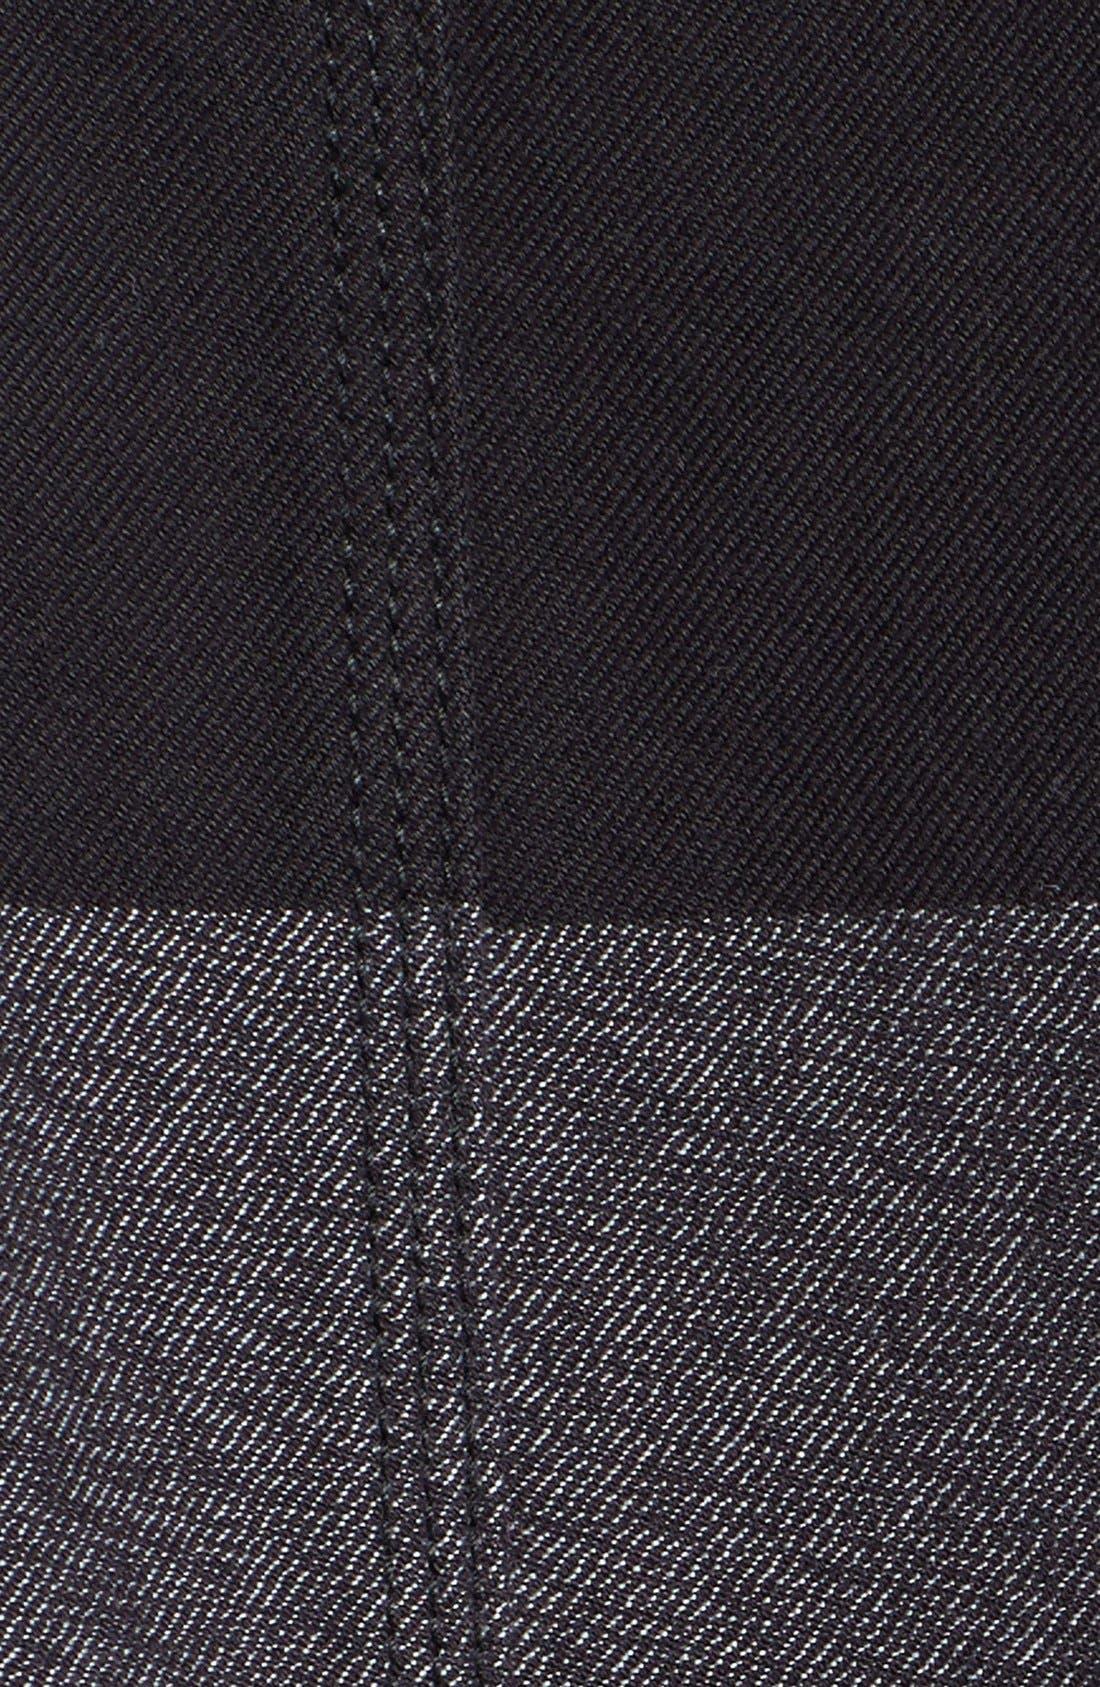 Alternate Image 3  - PRPS Block Stripe Railroad Chore Jacket